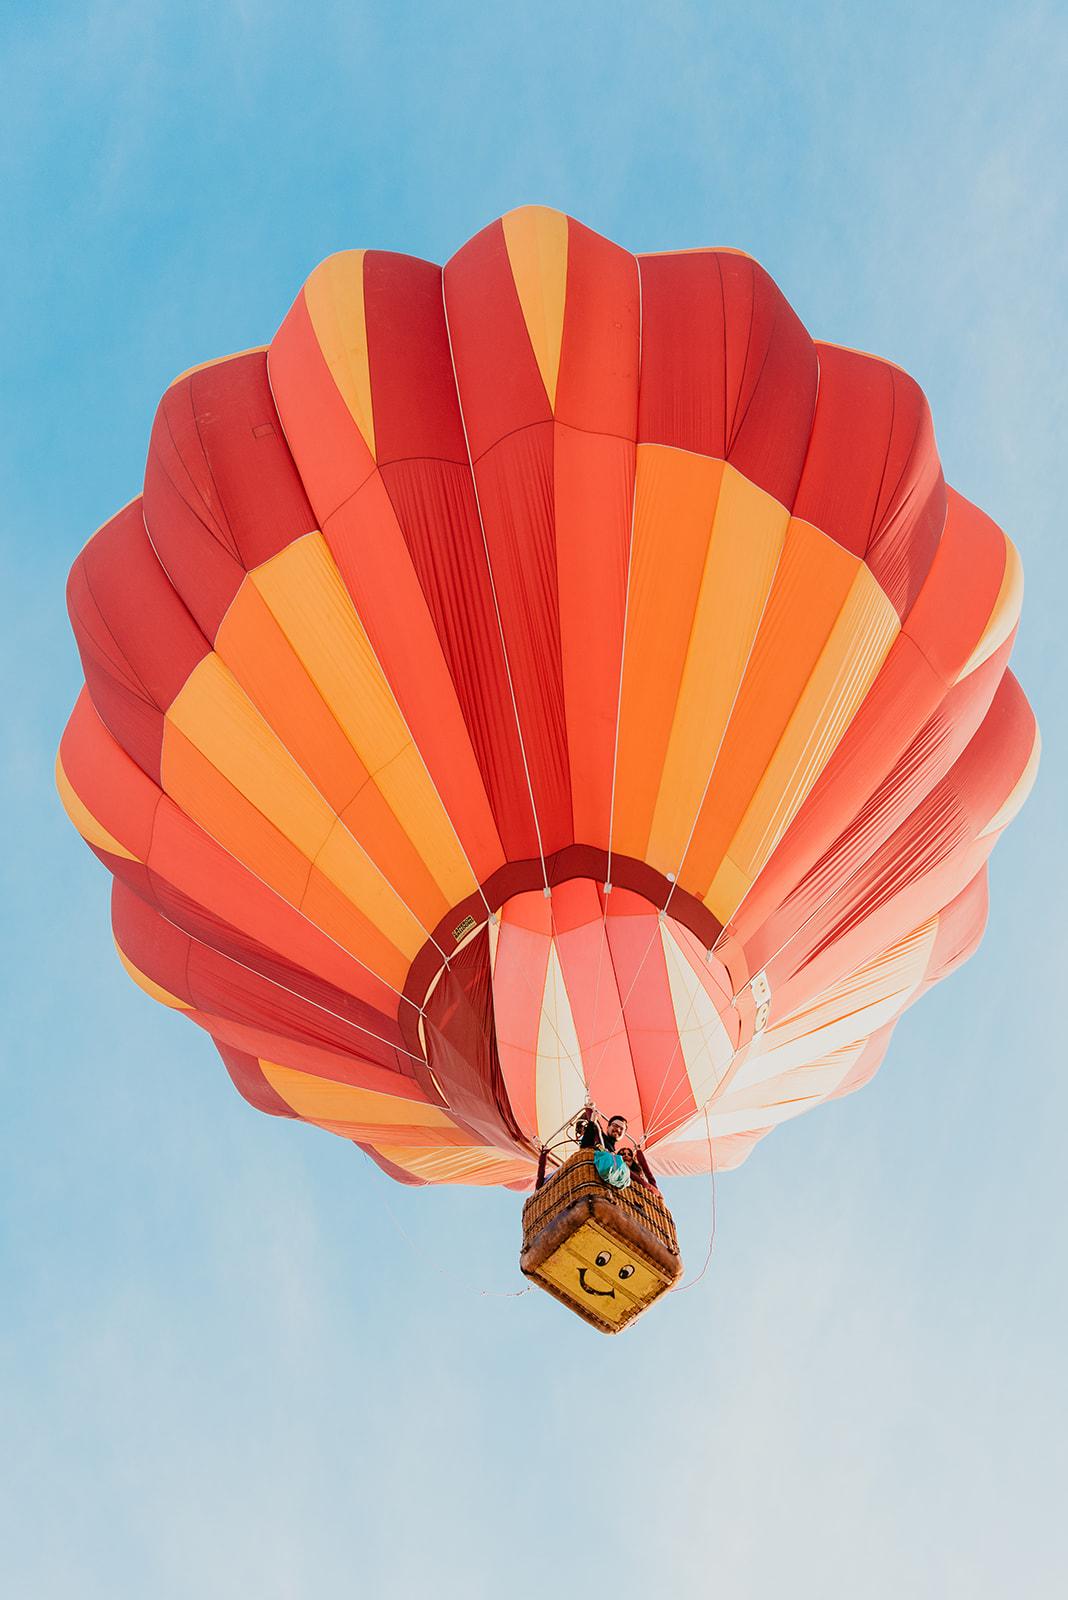 Hot air ballon engagement in the Las Vegas Desert